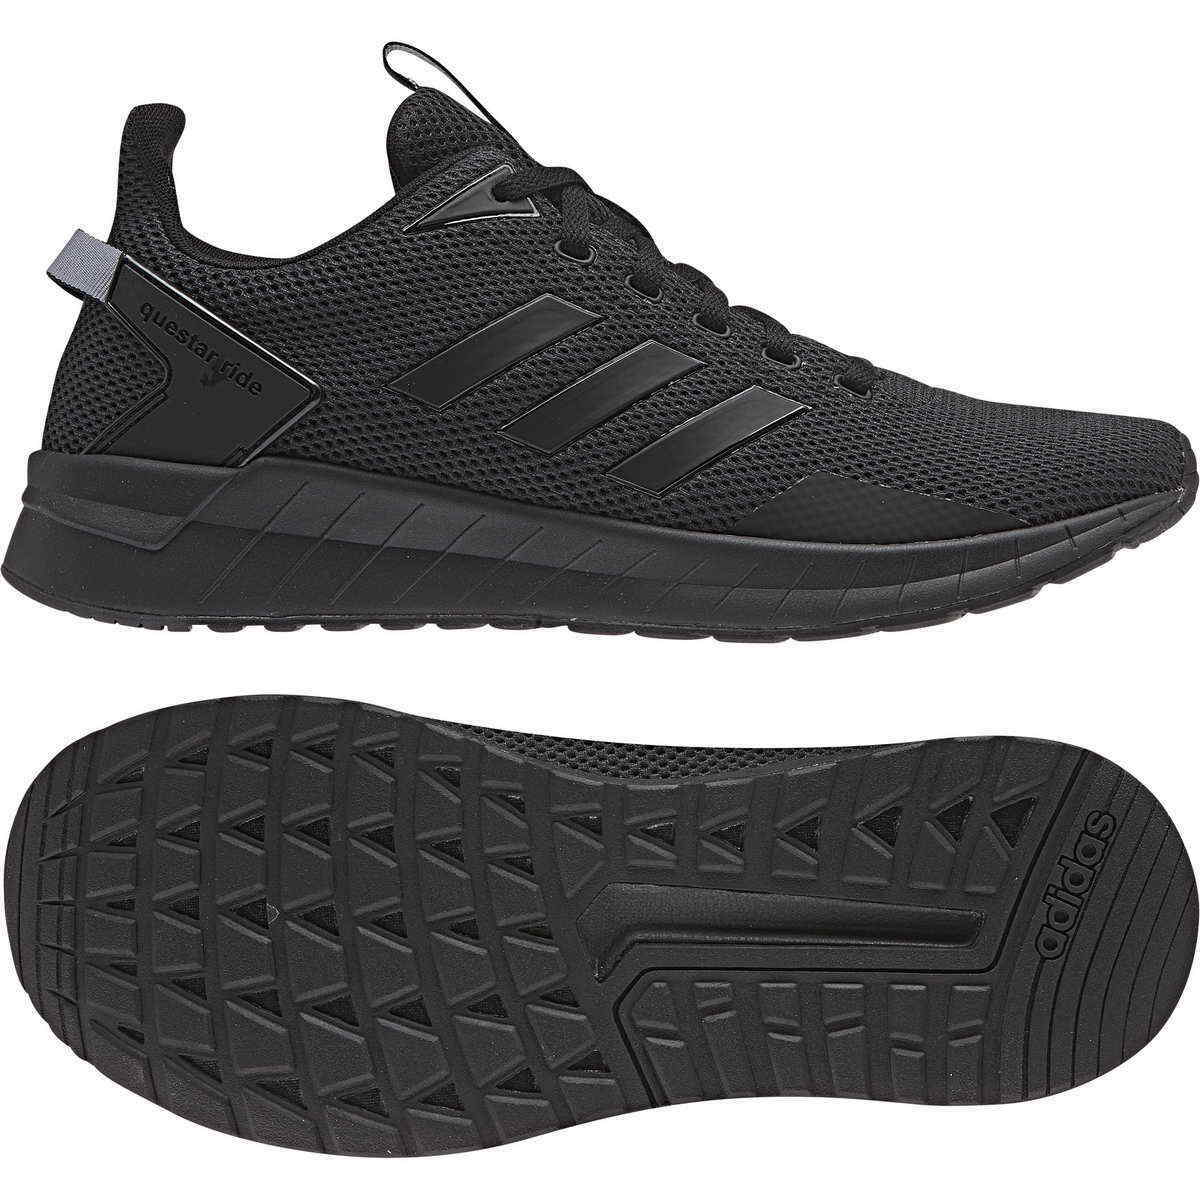 Adidas Sneaker Questar Ride black carbon schwarz B44806 Sport Turnschuhe